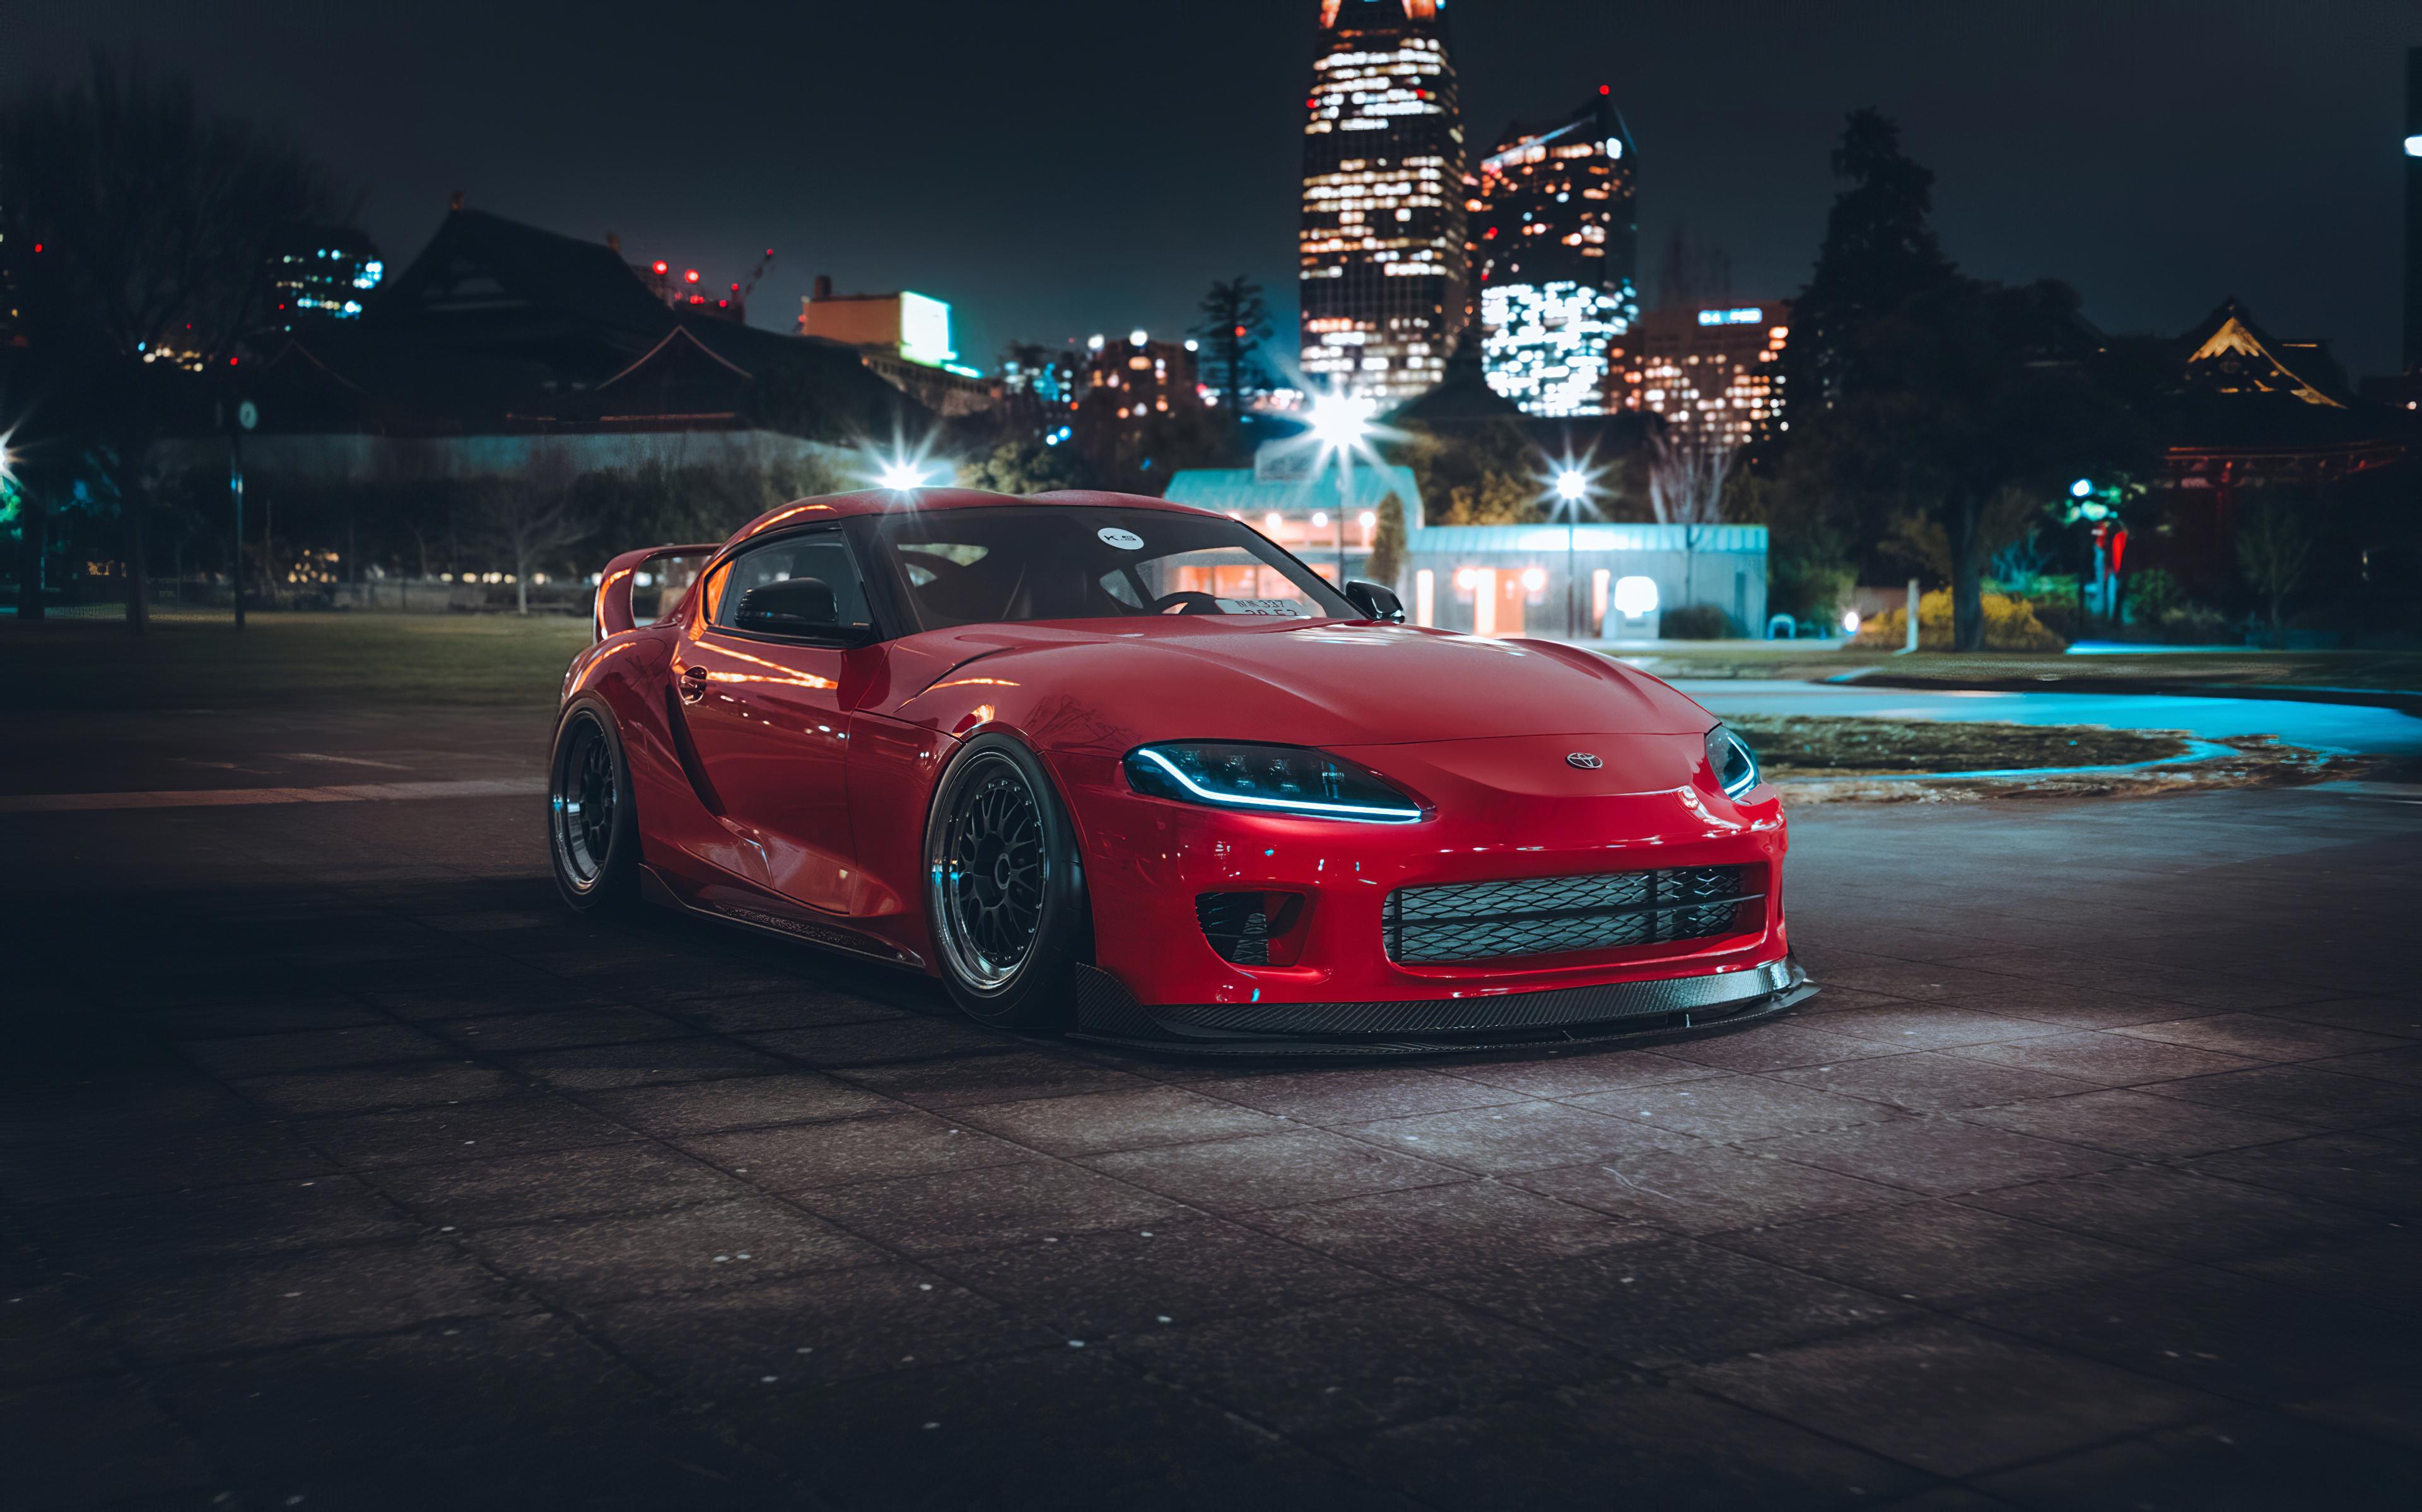 toyota supra 2020 1577653808 - Toyota Supra 2020 - Toyota Supra 2020 4k wallpaper